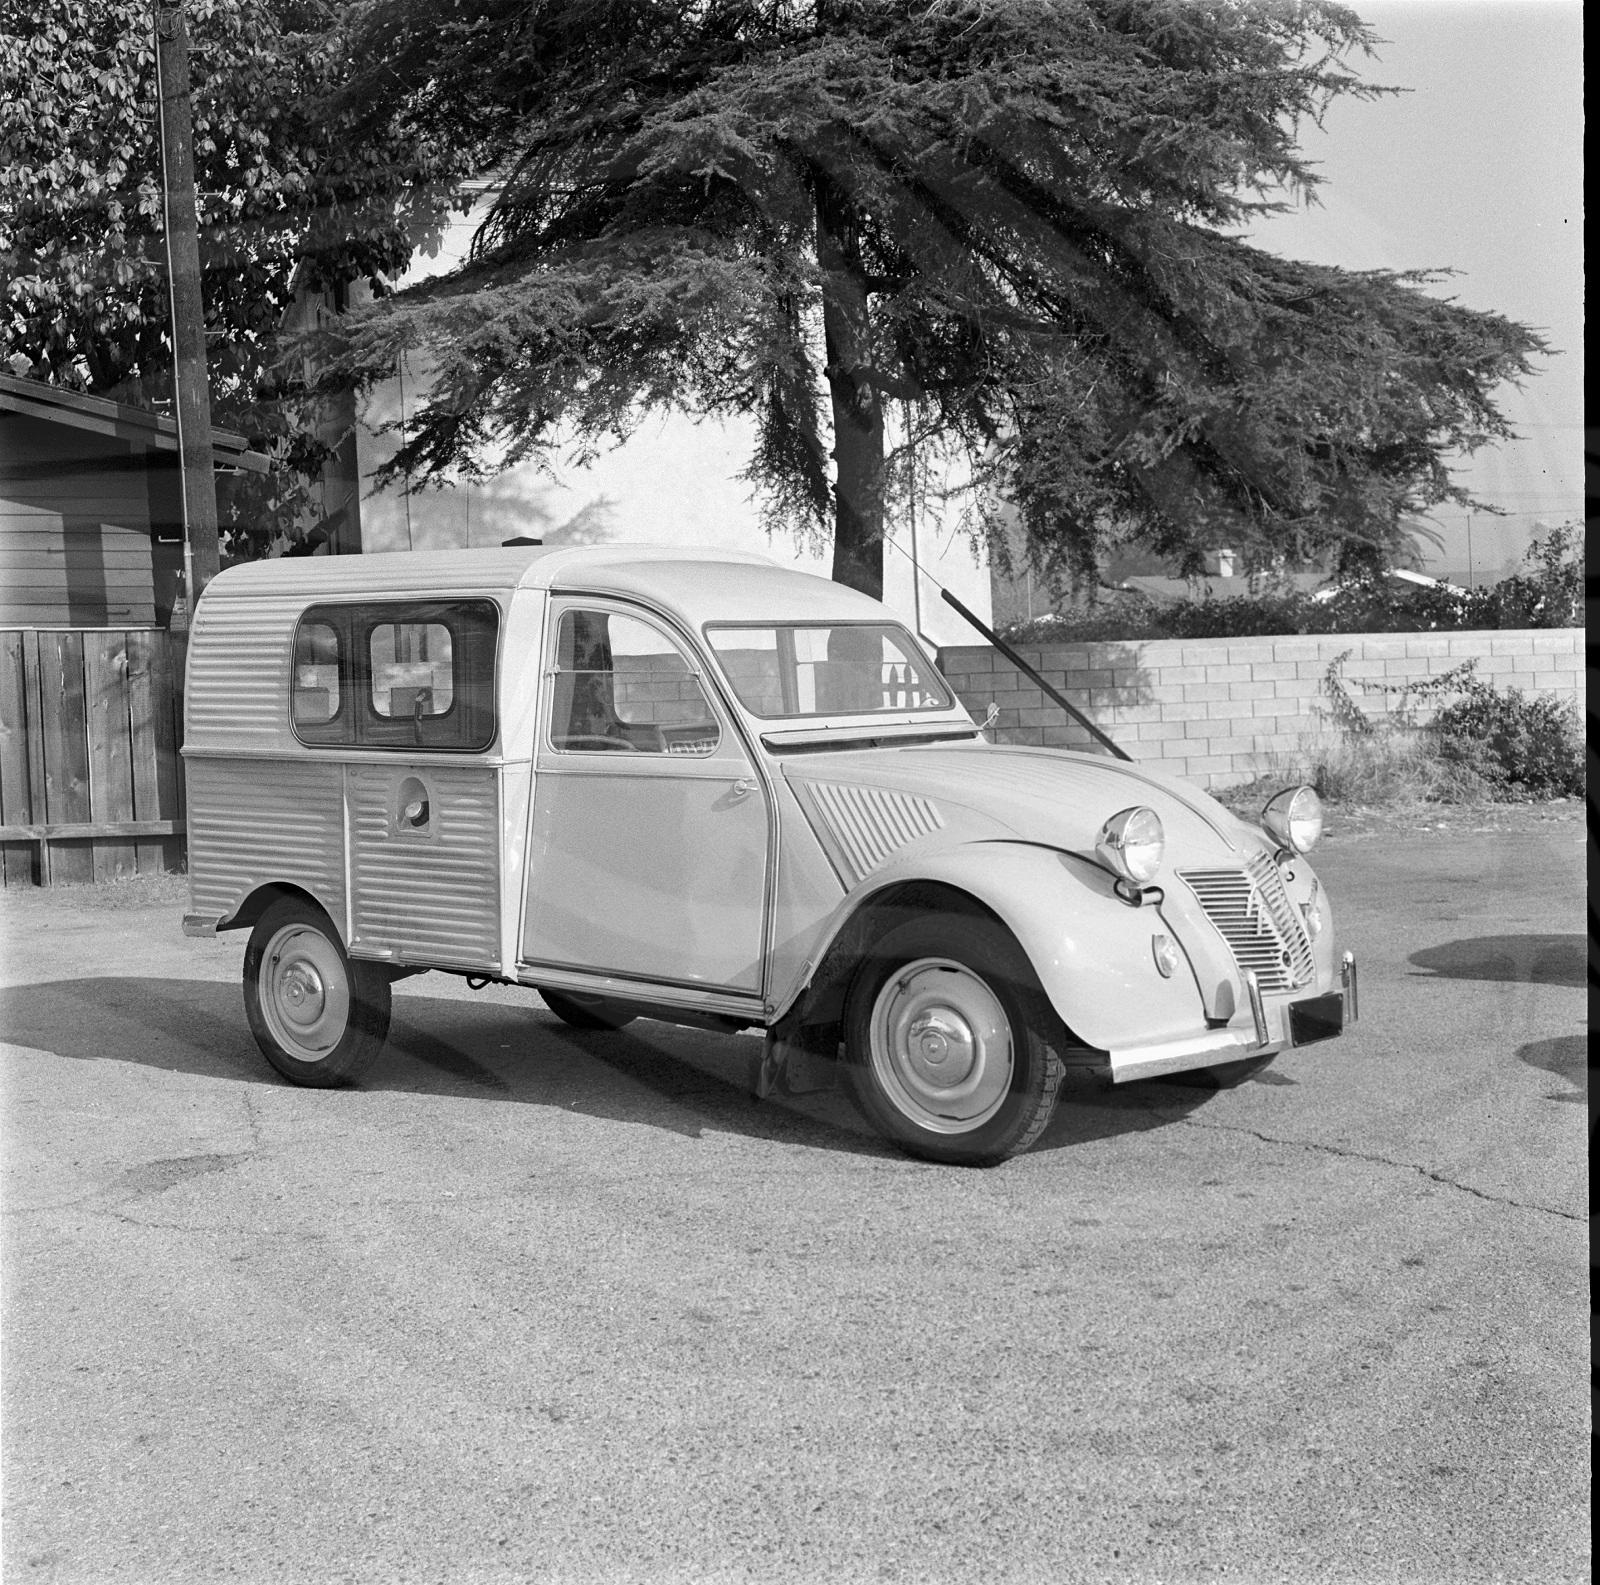 The 1972 2CV Wagon